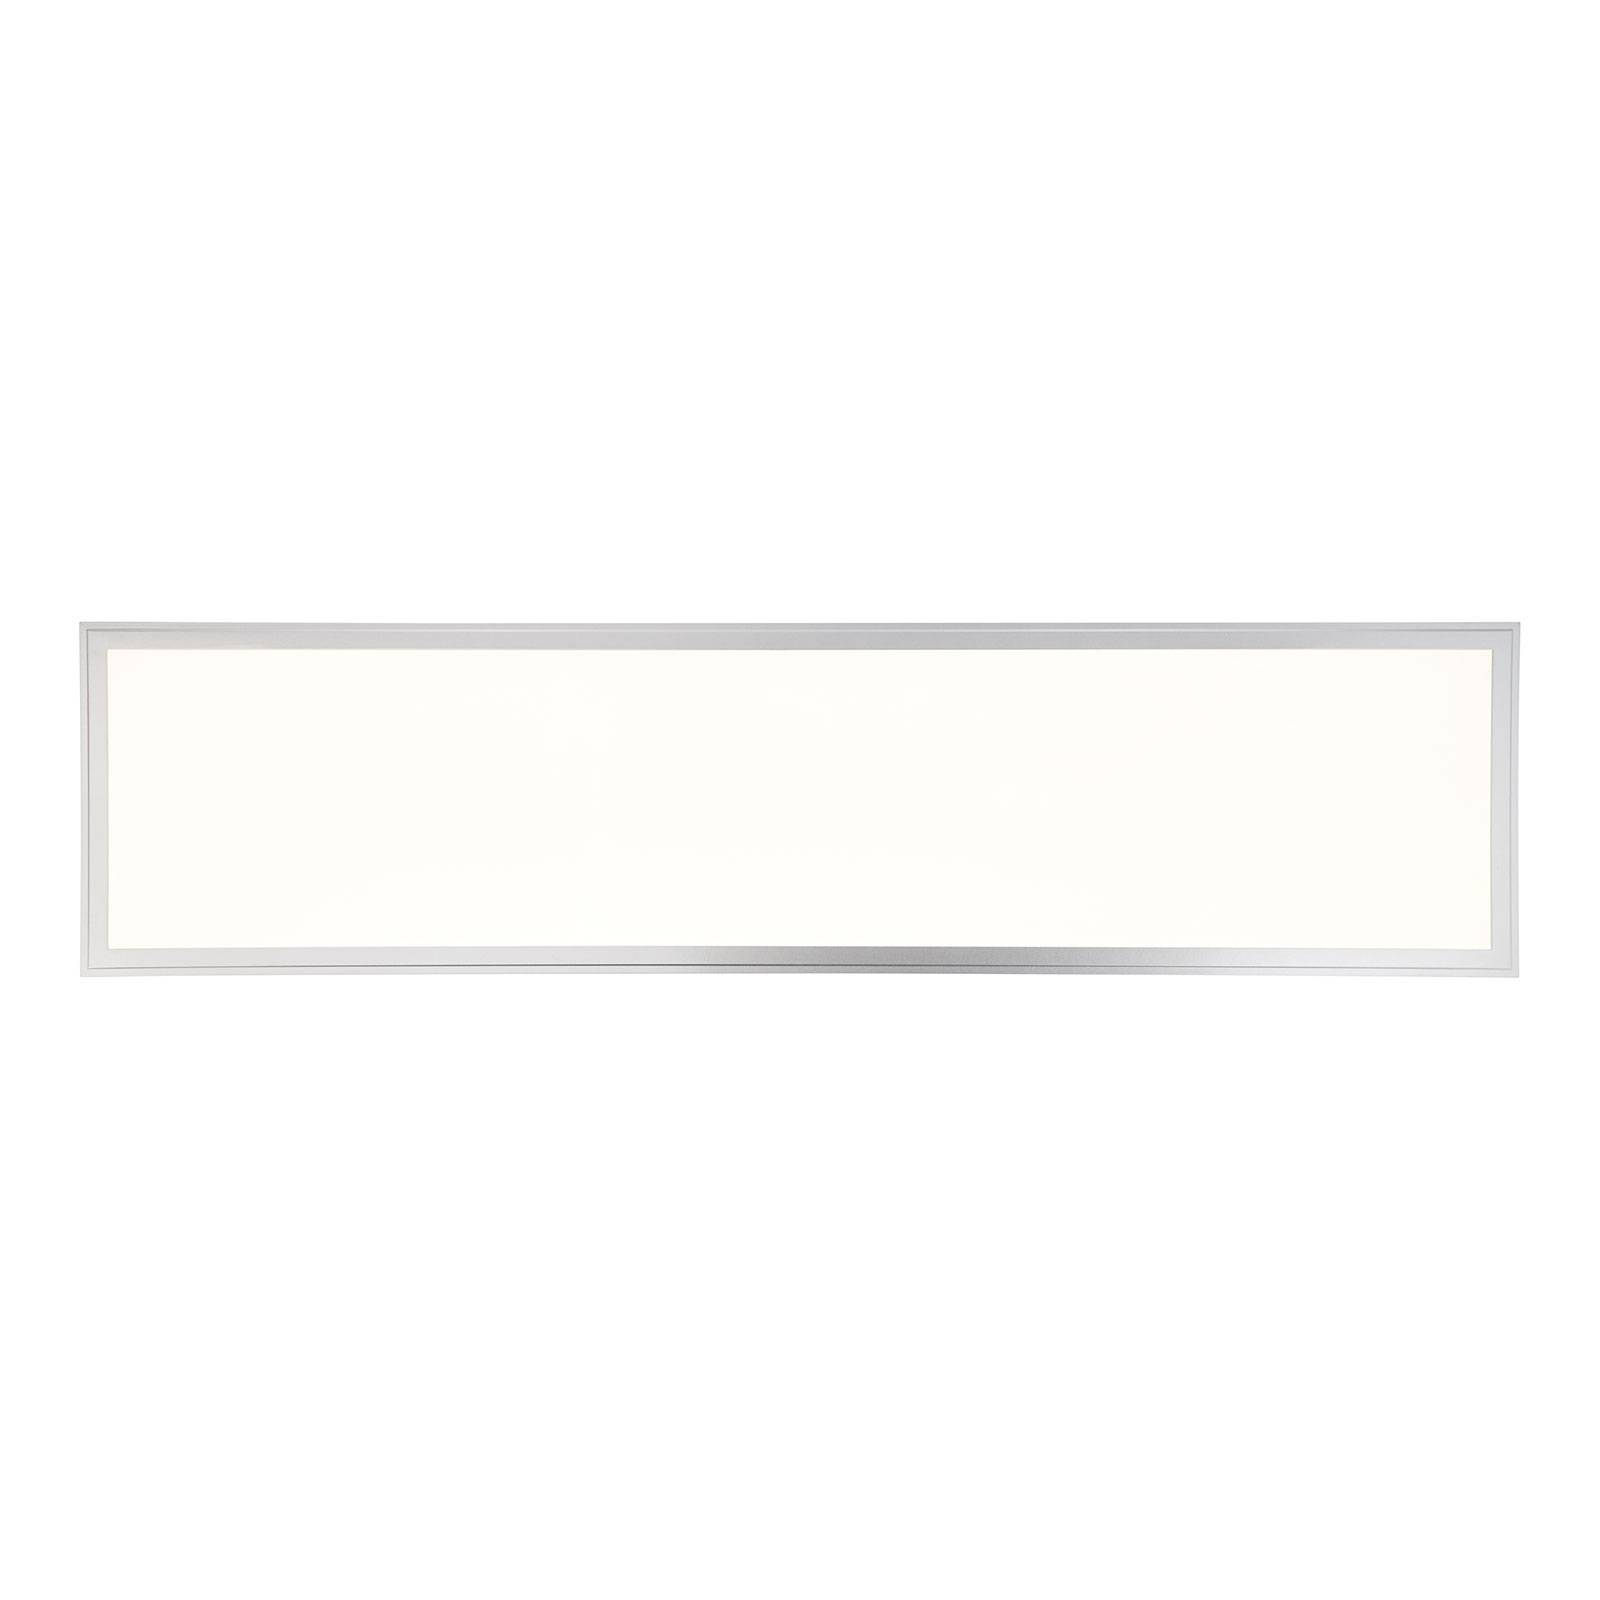 LED-kattovalaisin Alissa, 119,5x29,5 cm